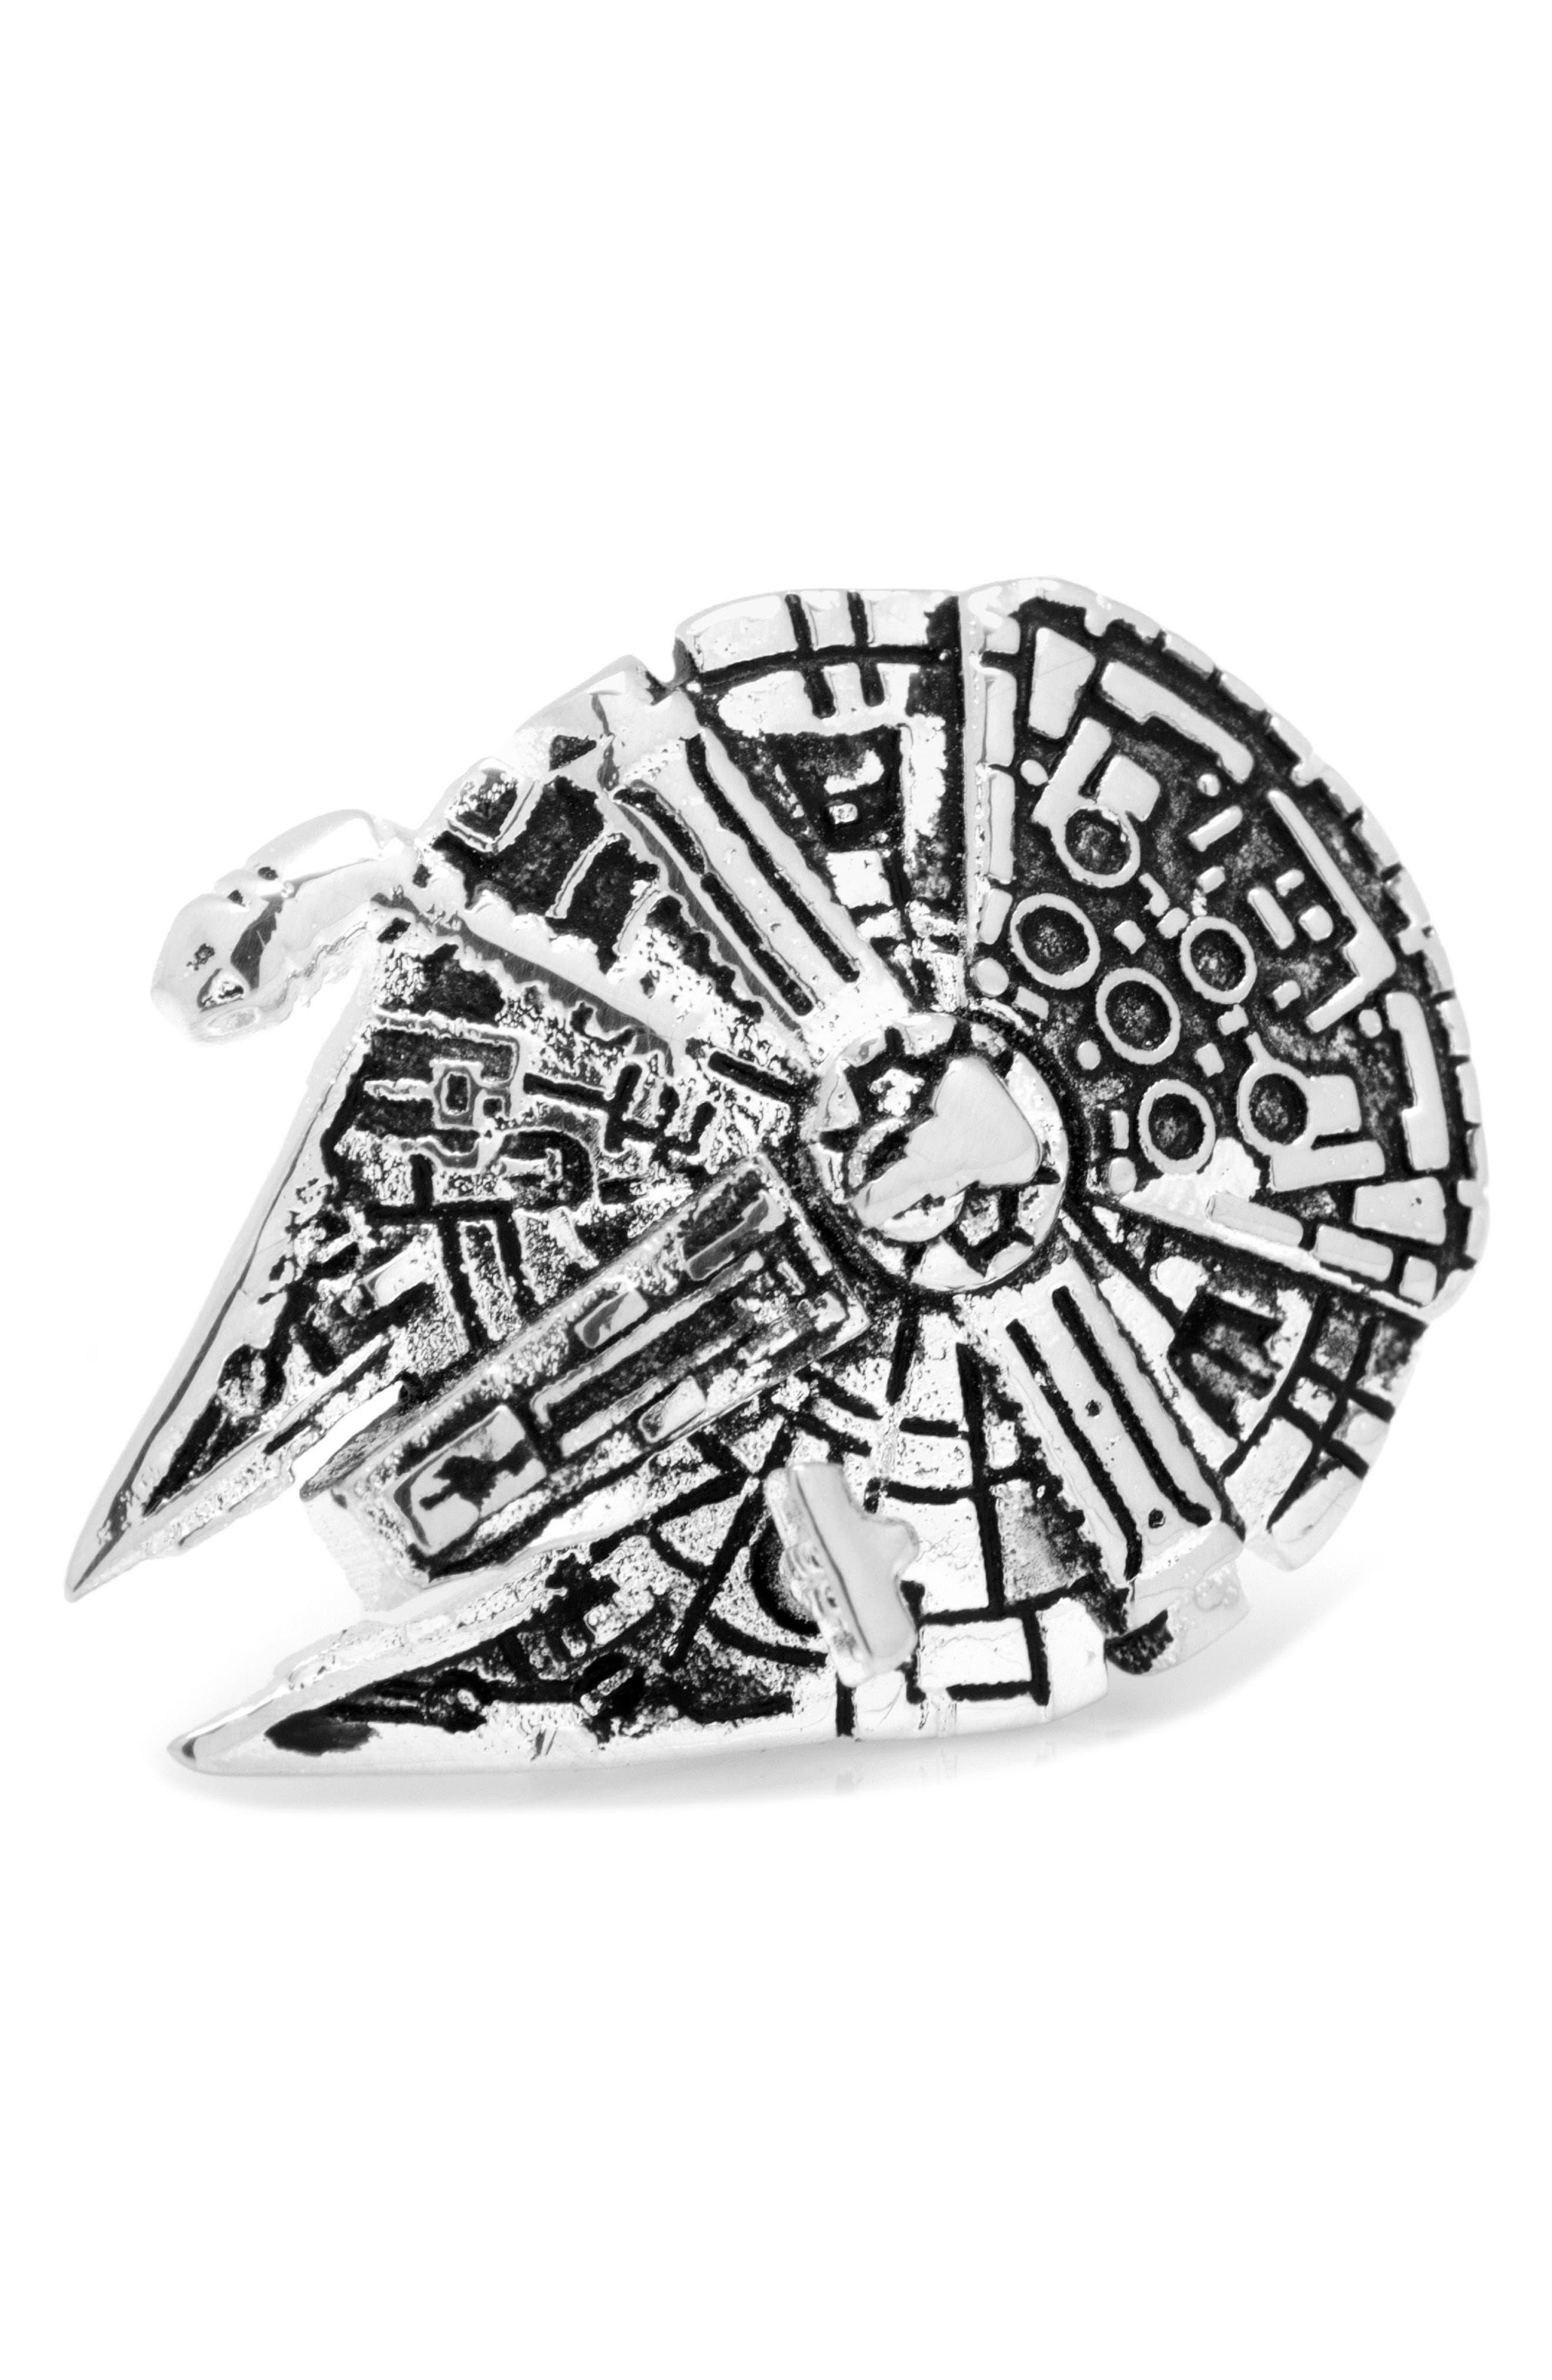 "Alternate Image 1 Selected - Cufflinks Inc. ""Star Wars"" 3D Millennium Falcon Lapel Pin"